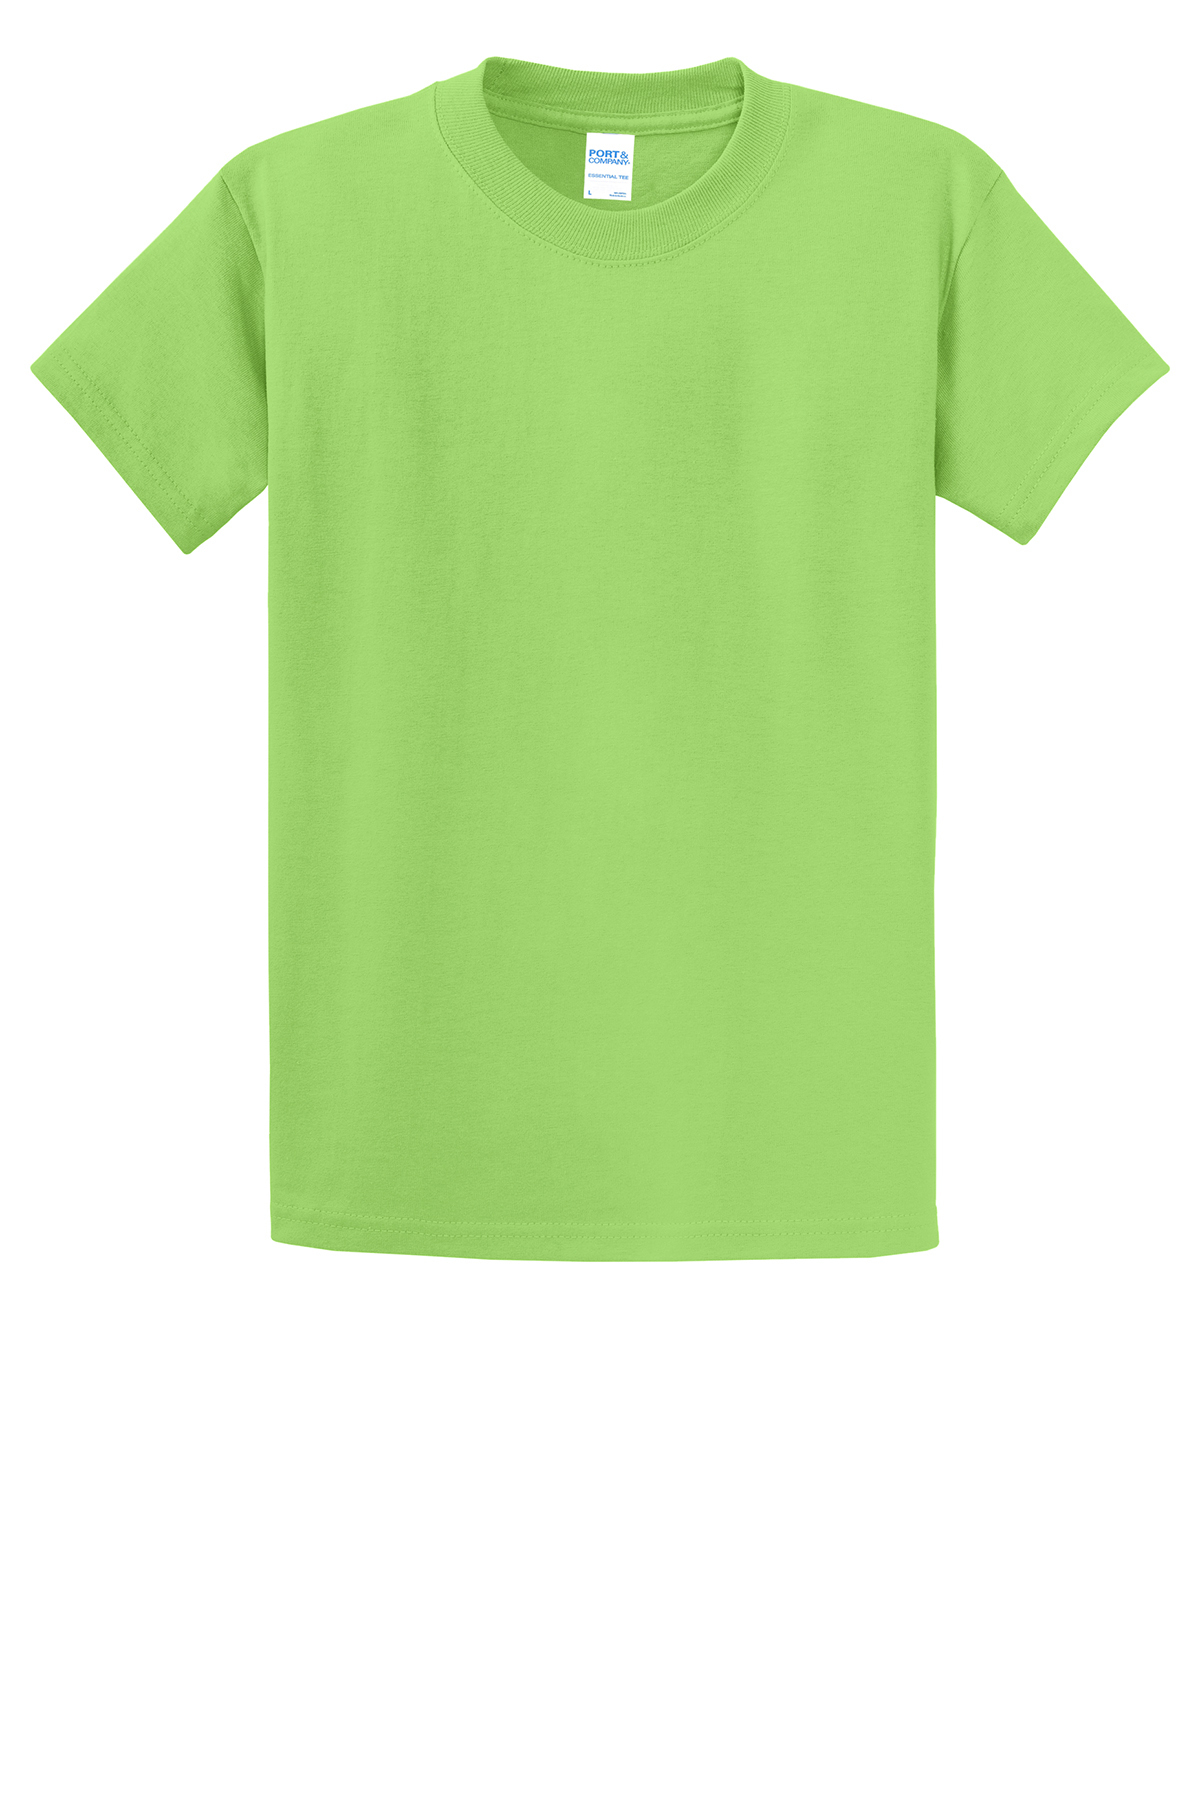 Never Stop Making Art Heather Grey Adult T-Shirt